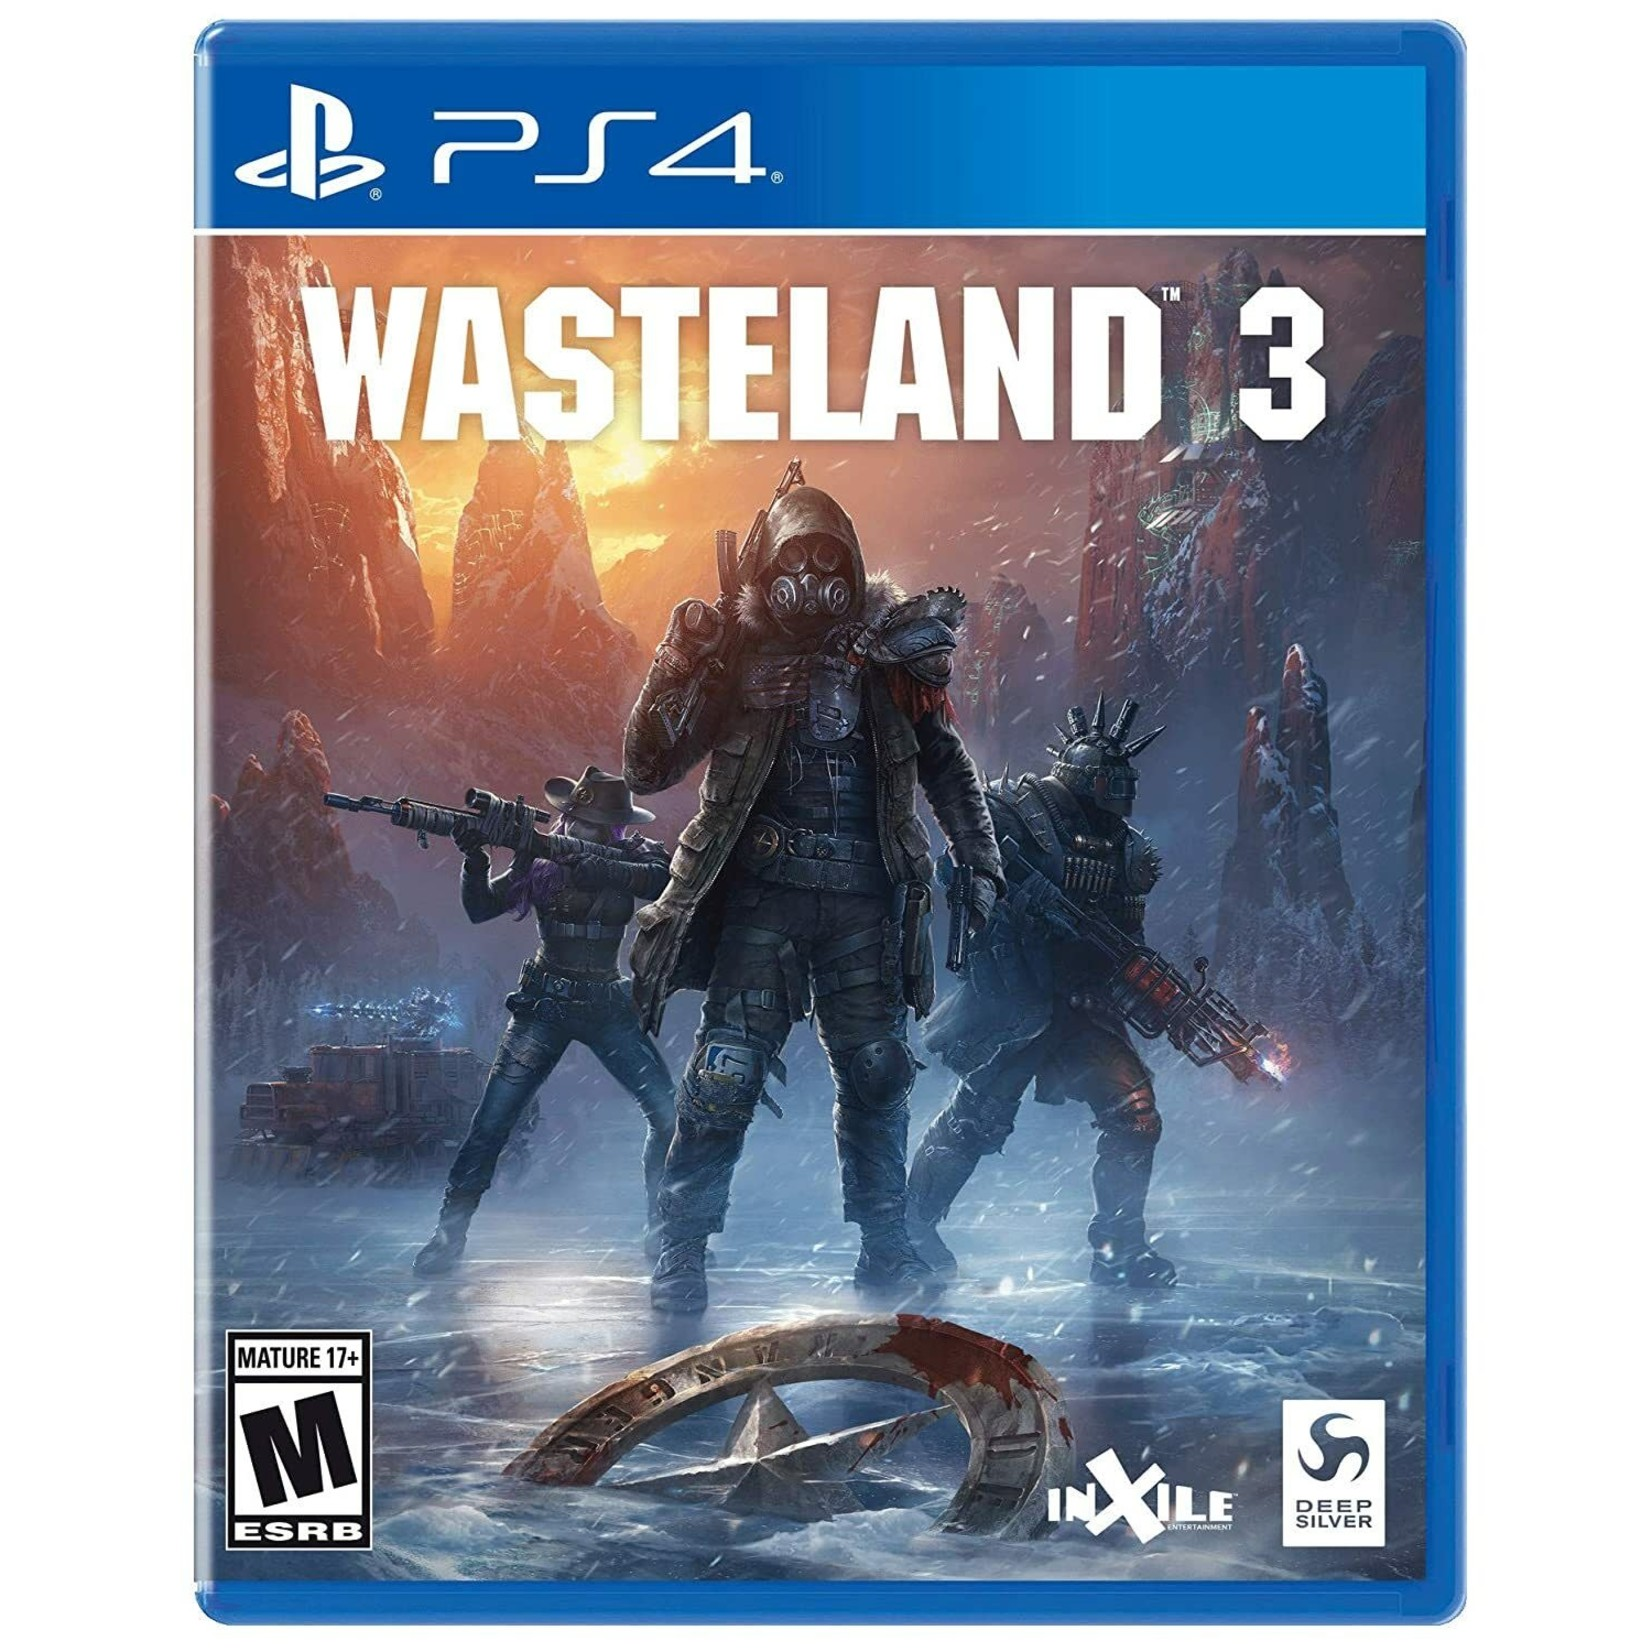 PS4-Wasteland 3